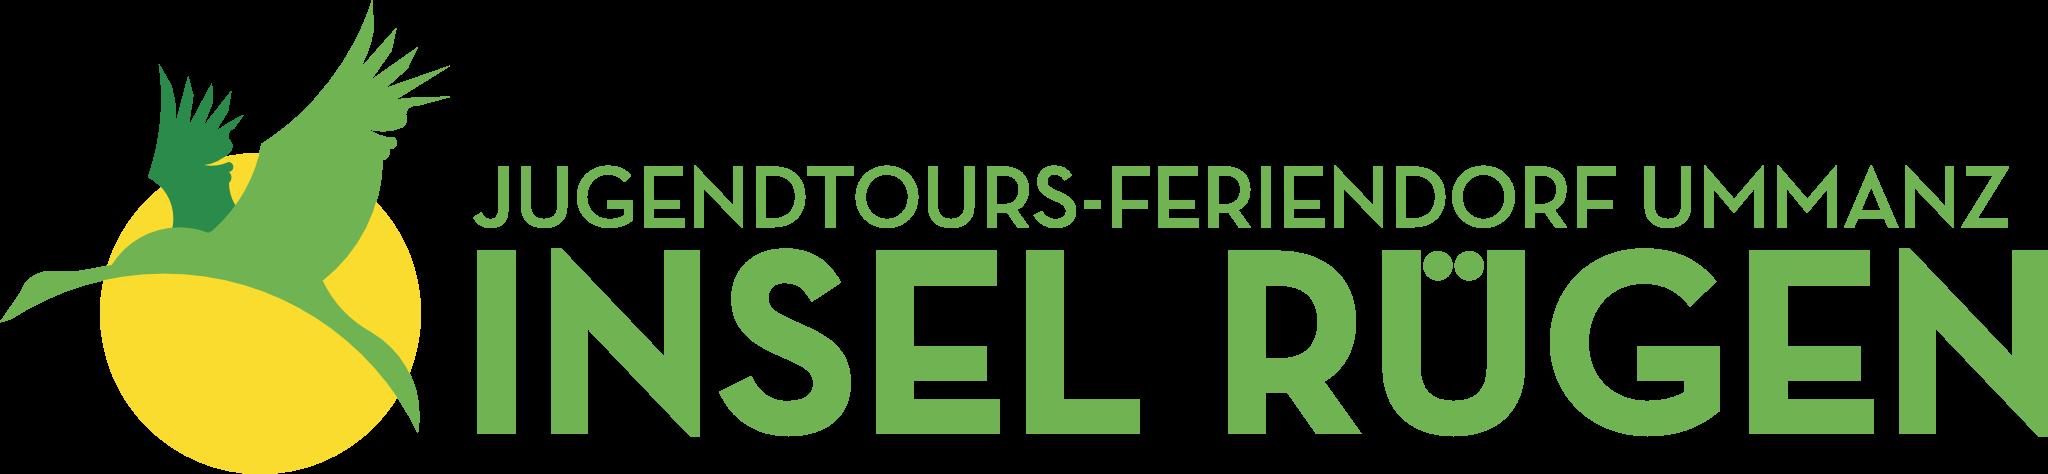 Logo Jugendtours-Feriendorf Ummanz / Insel Rügen